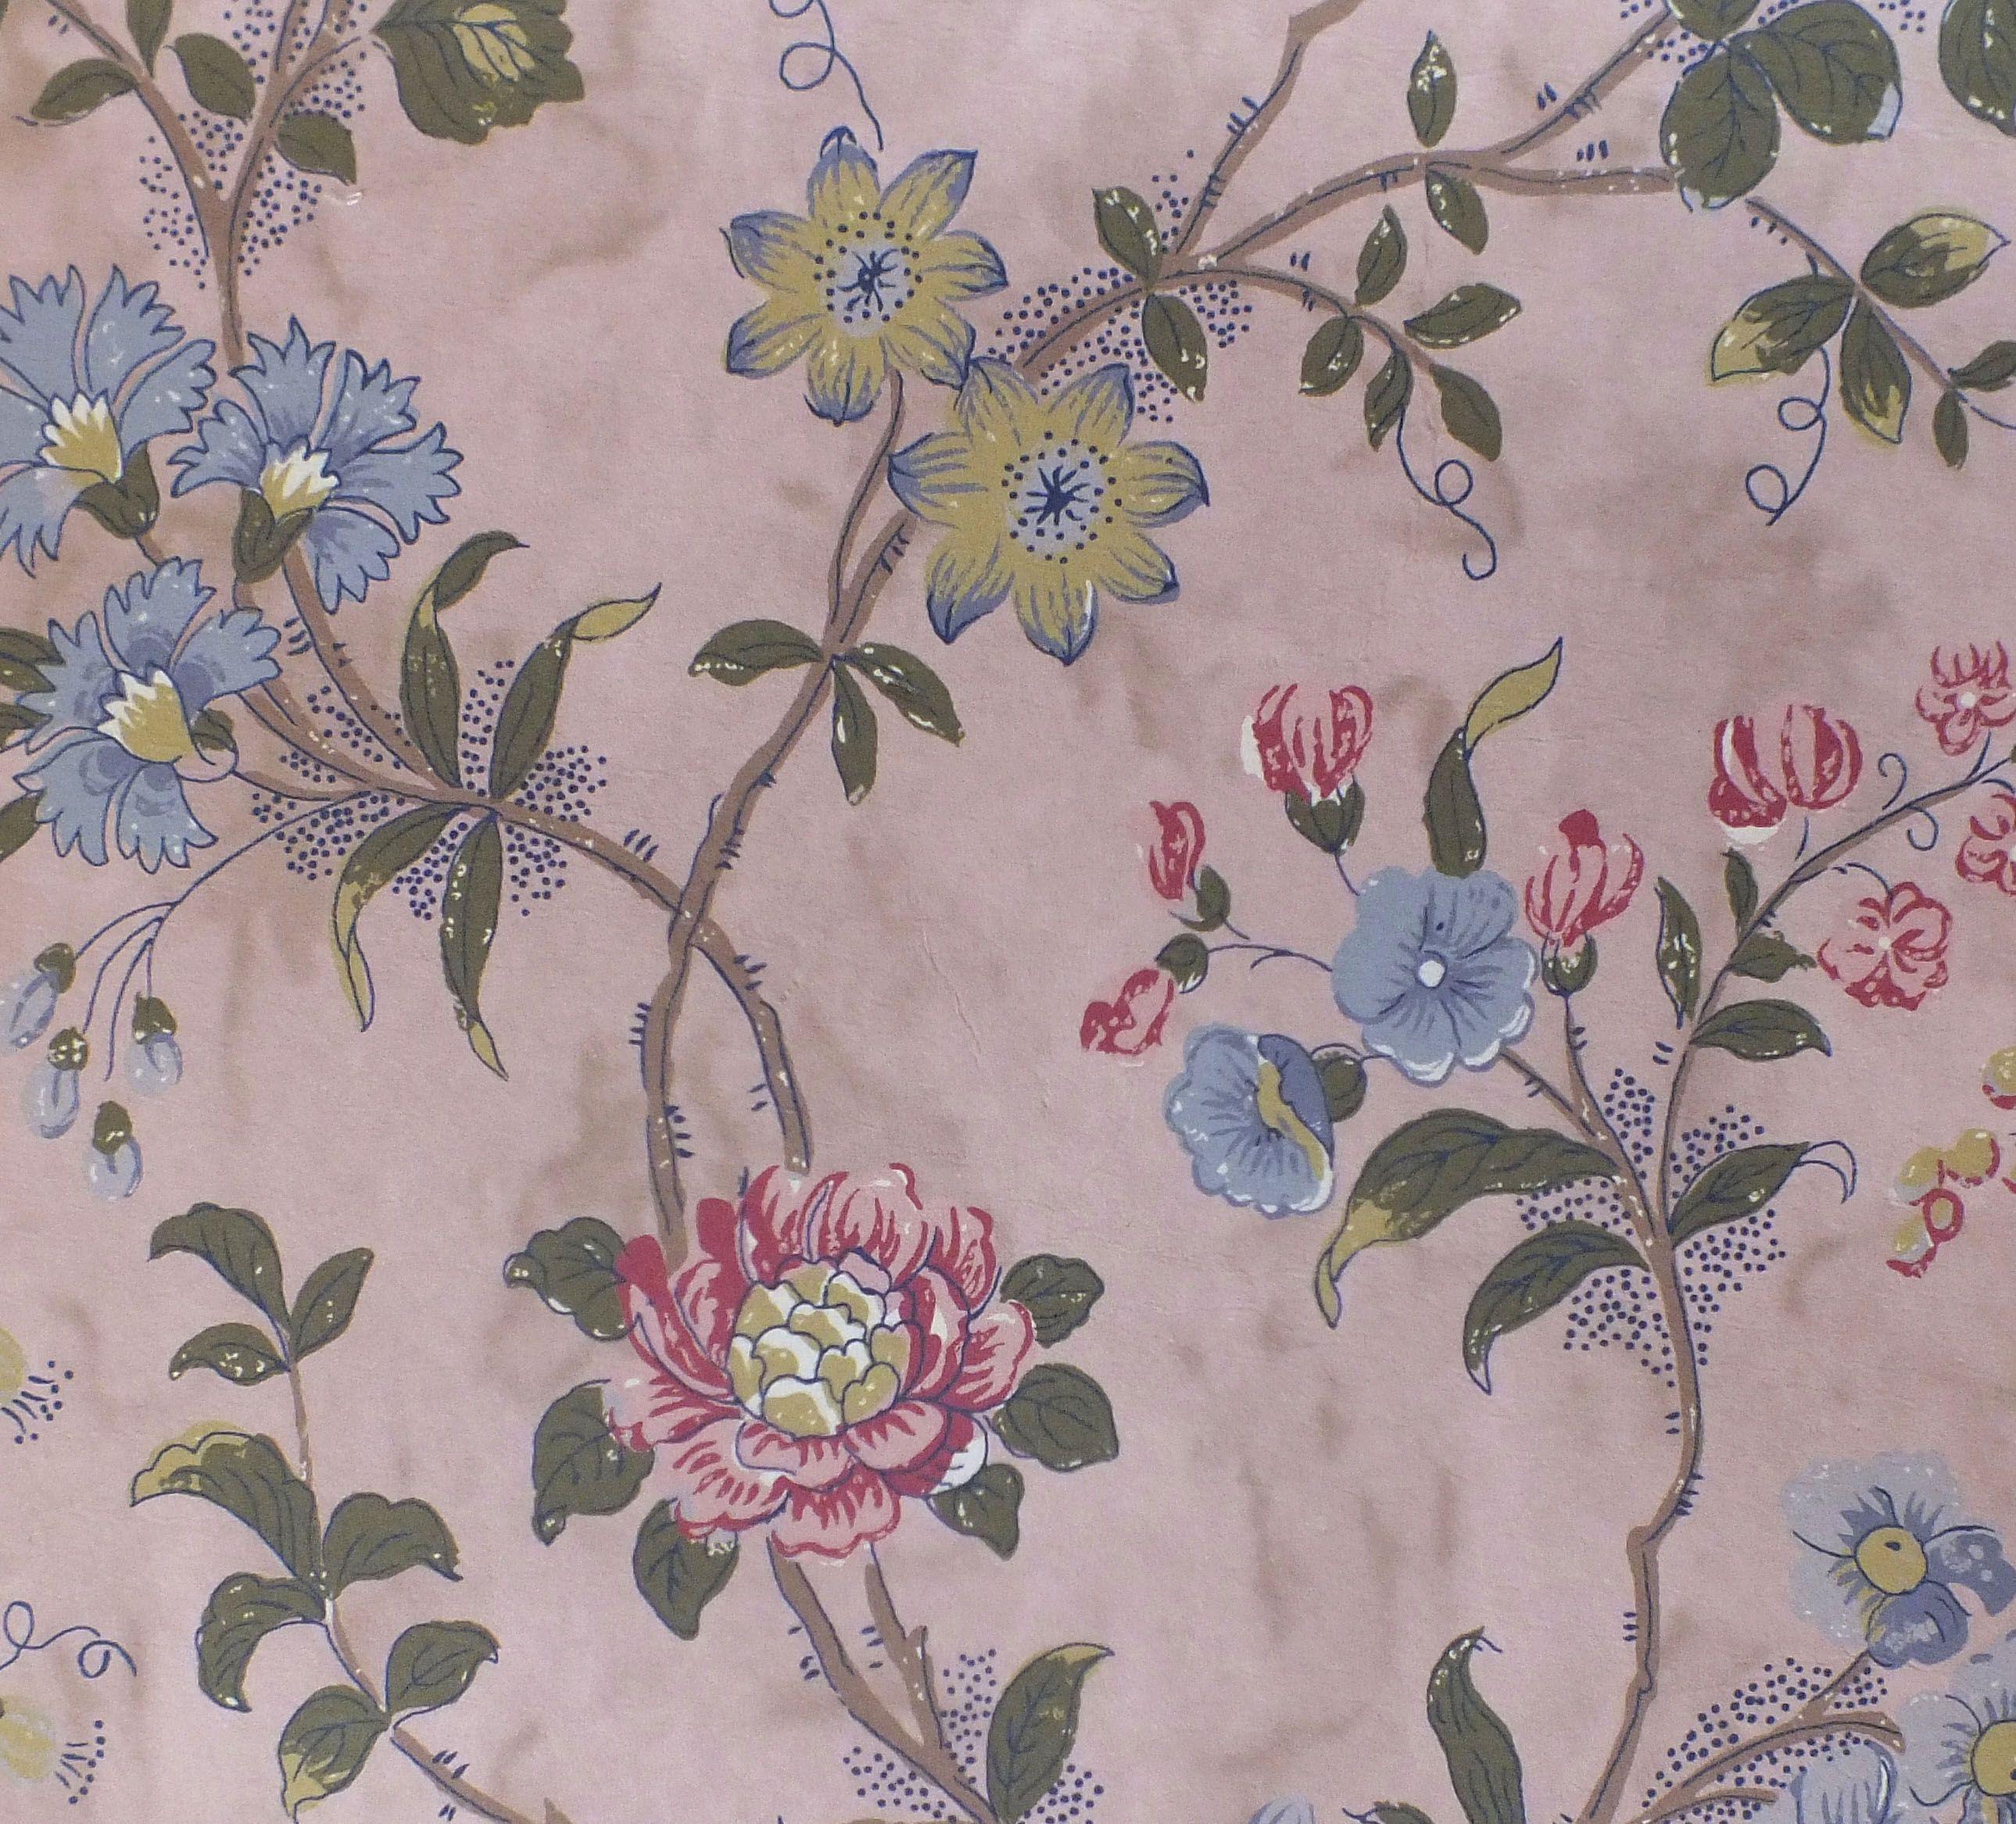 Tuileries Wallpaper In Plaster Pink, Watts 1874